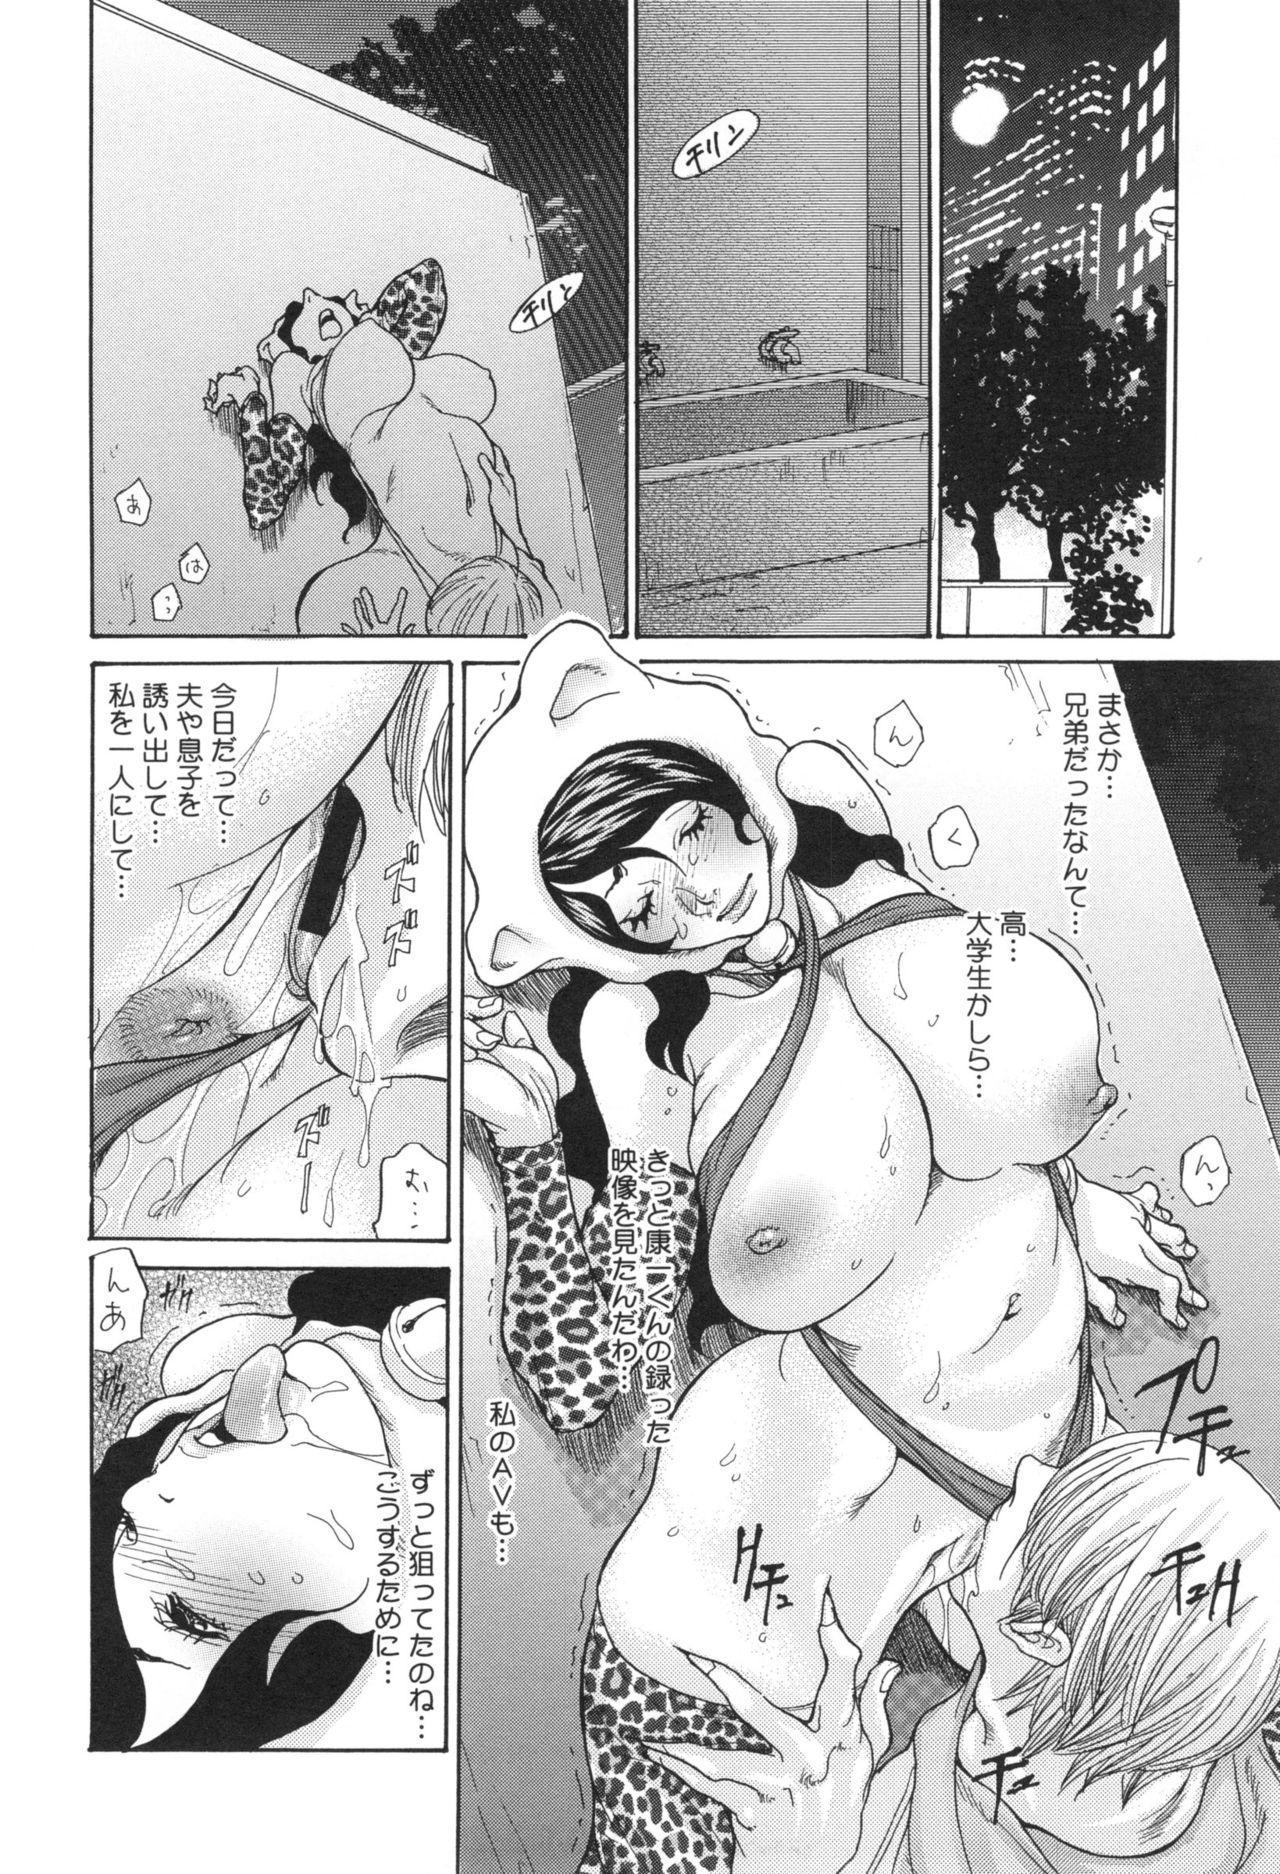 Niku-zuma Netorare Maniacs 182